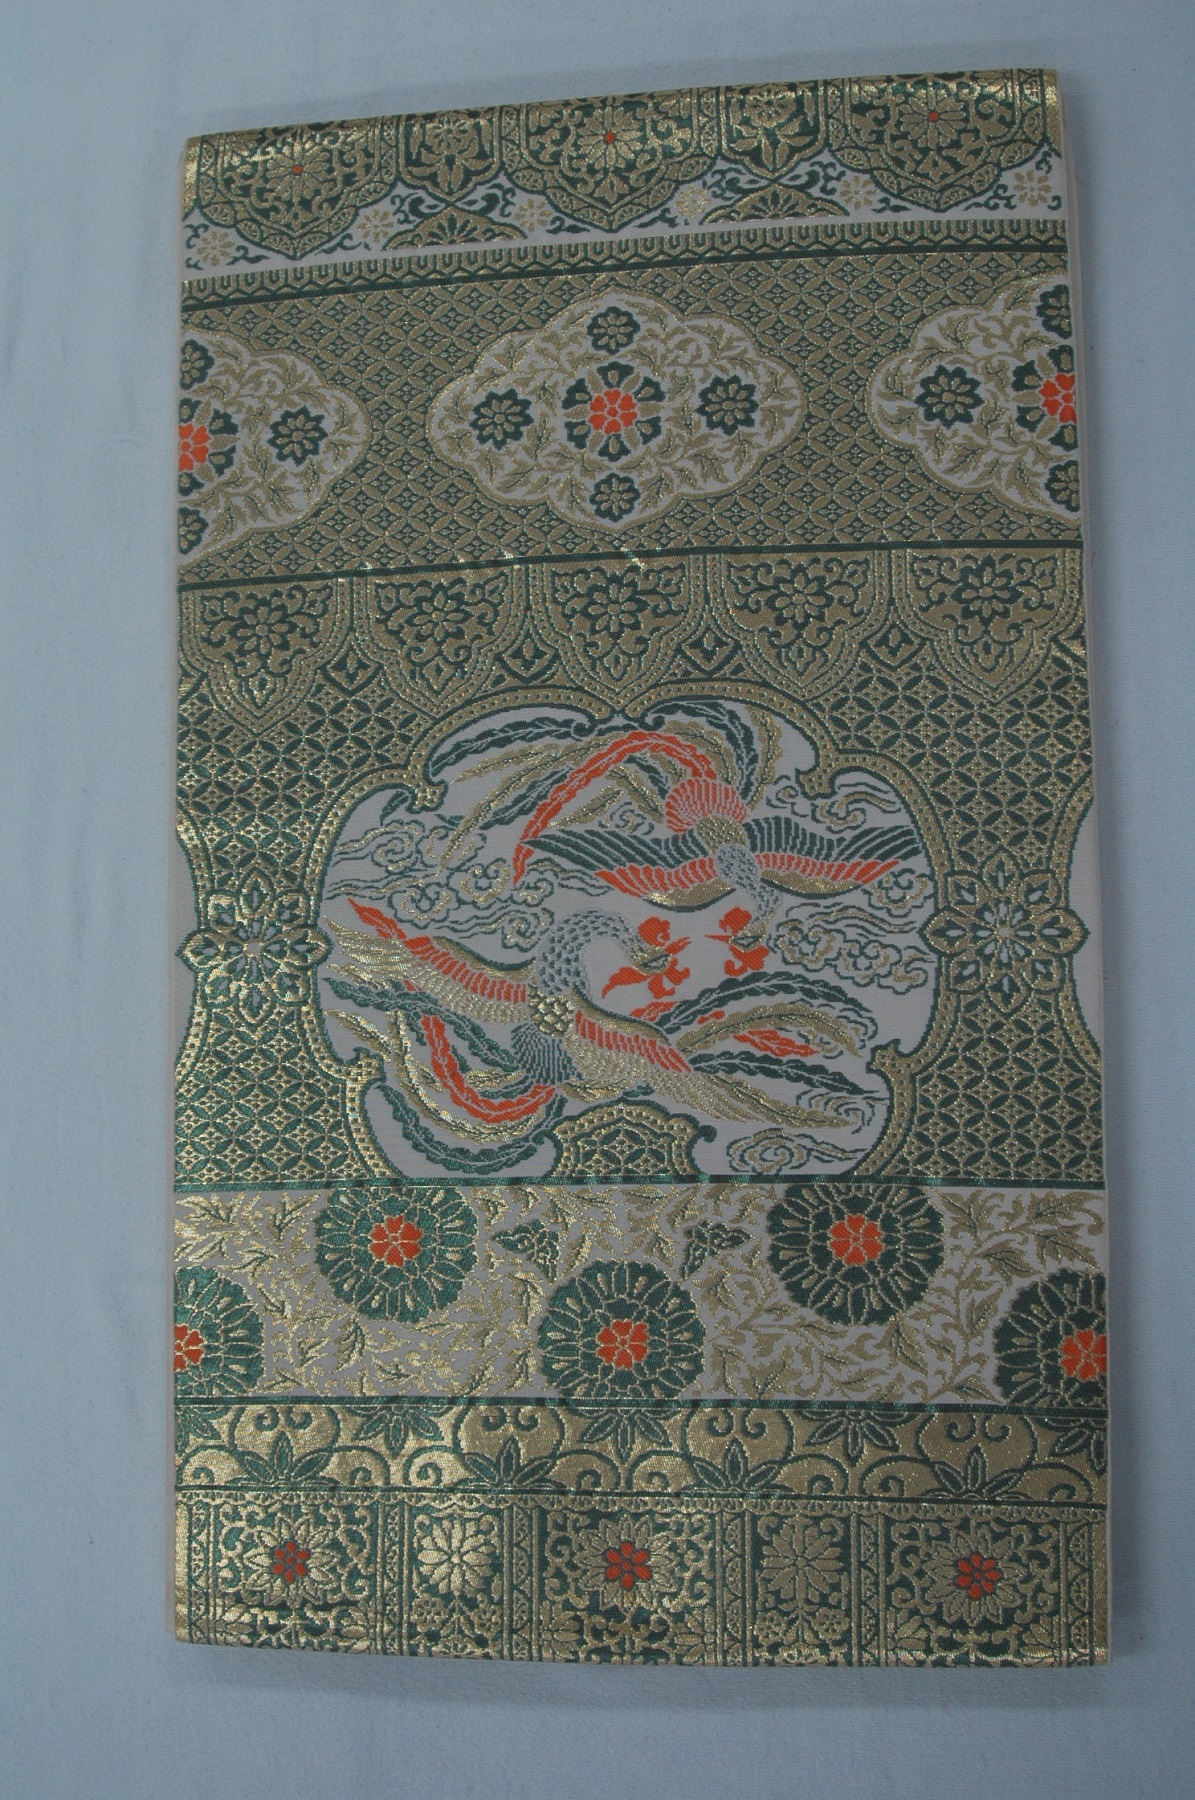 Monoki「モノキ」 【仕立て上がり 袋帯 金・緑 鳳凰柄 2140】 着物リメイク&リユース リサイクル